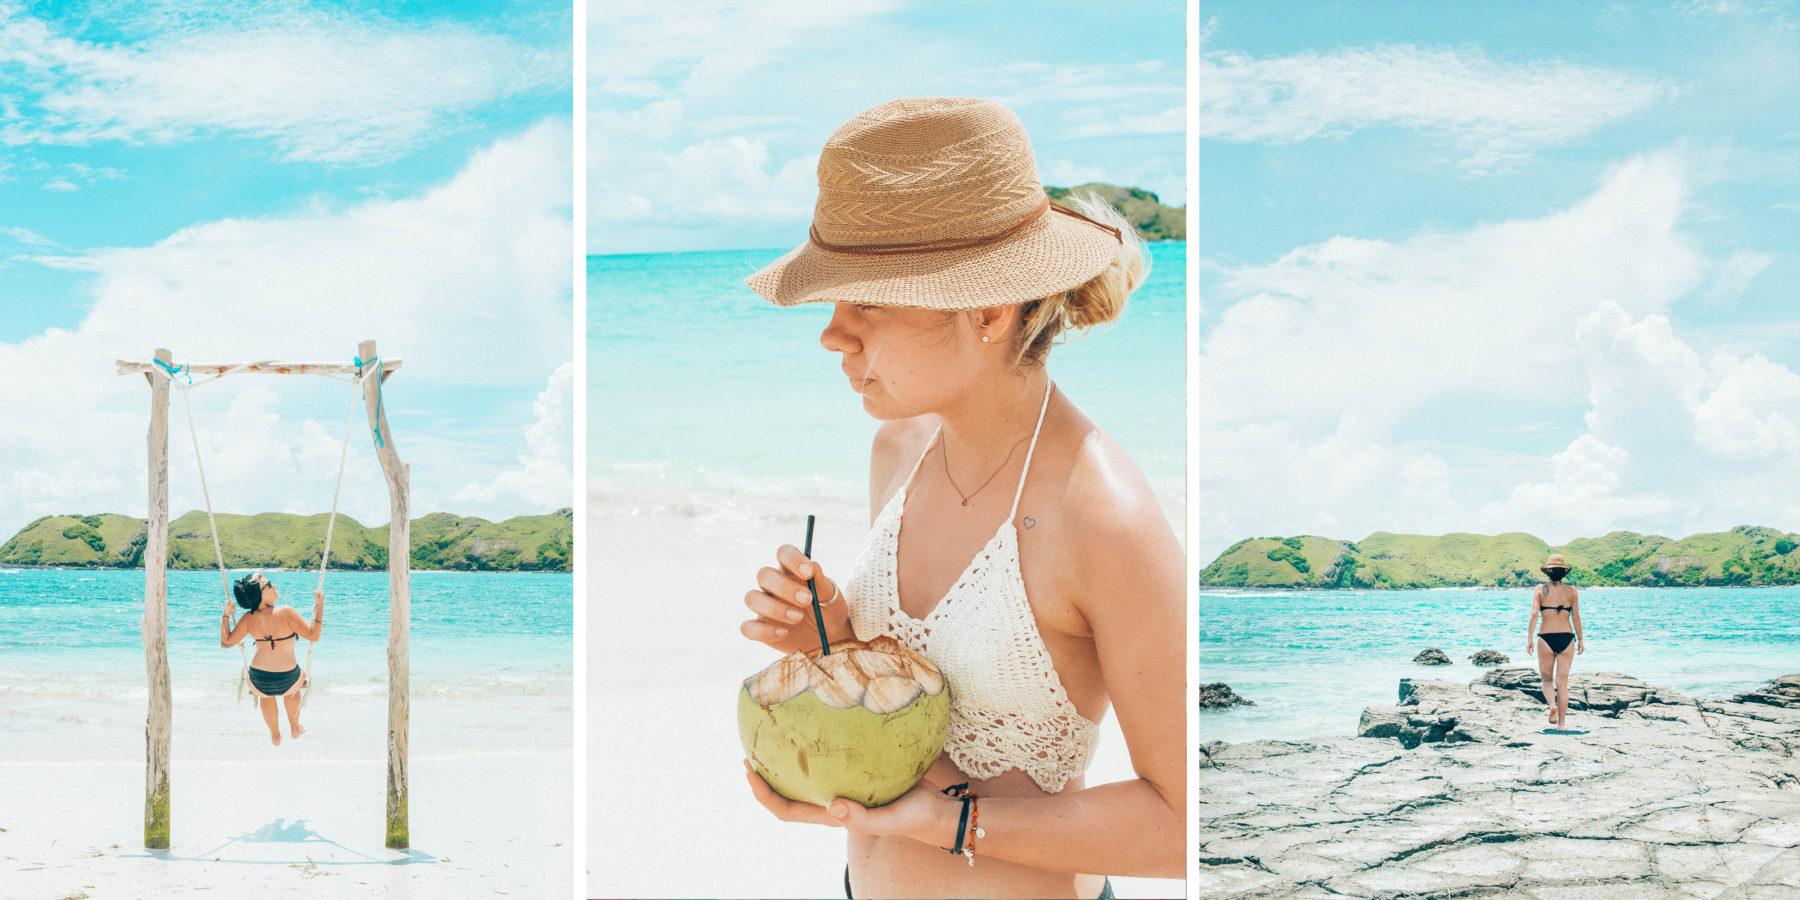 lombok blue water beach time relax friendship ocean tan lombok indonesia coconut water